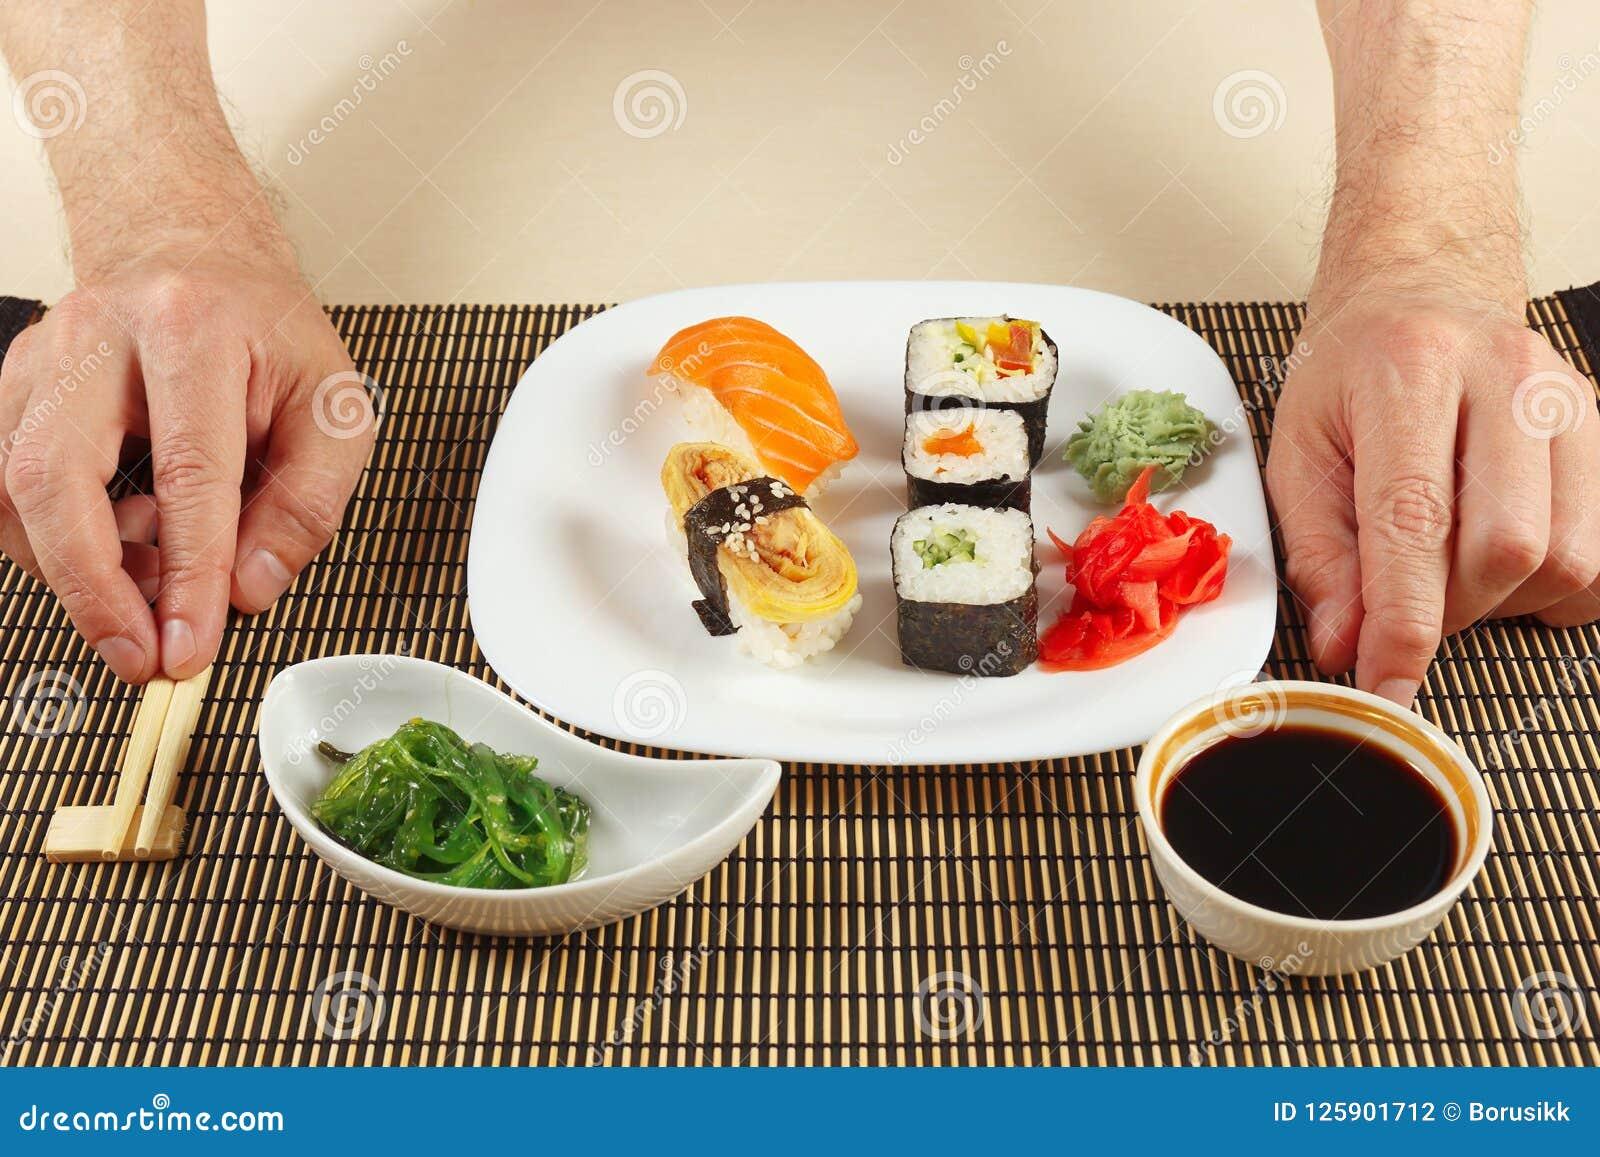 Hands With Chopsticks And Sushi Set Hiyashi Wakame Salad